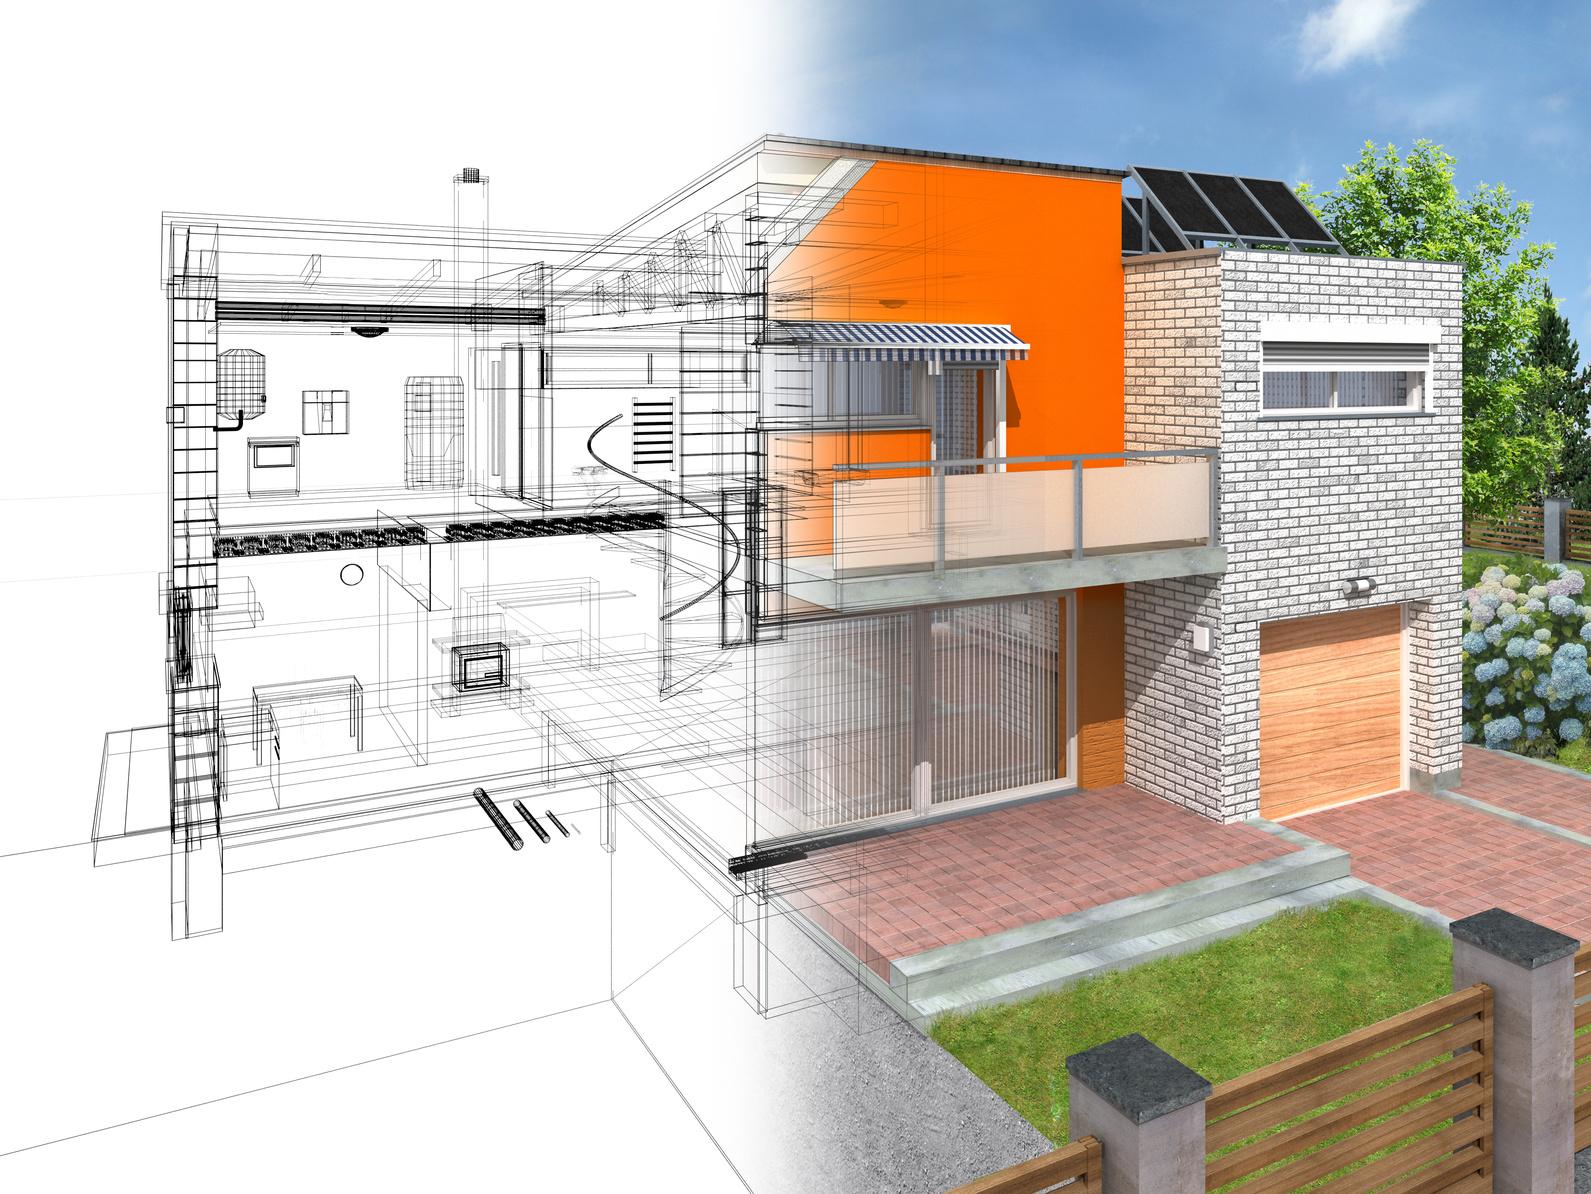 Architekt Düren architekt jörg makowka brandschutzunterweisung in düren